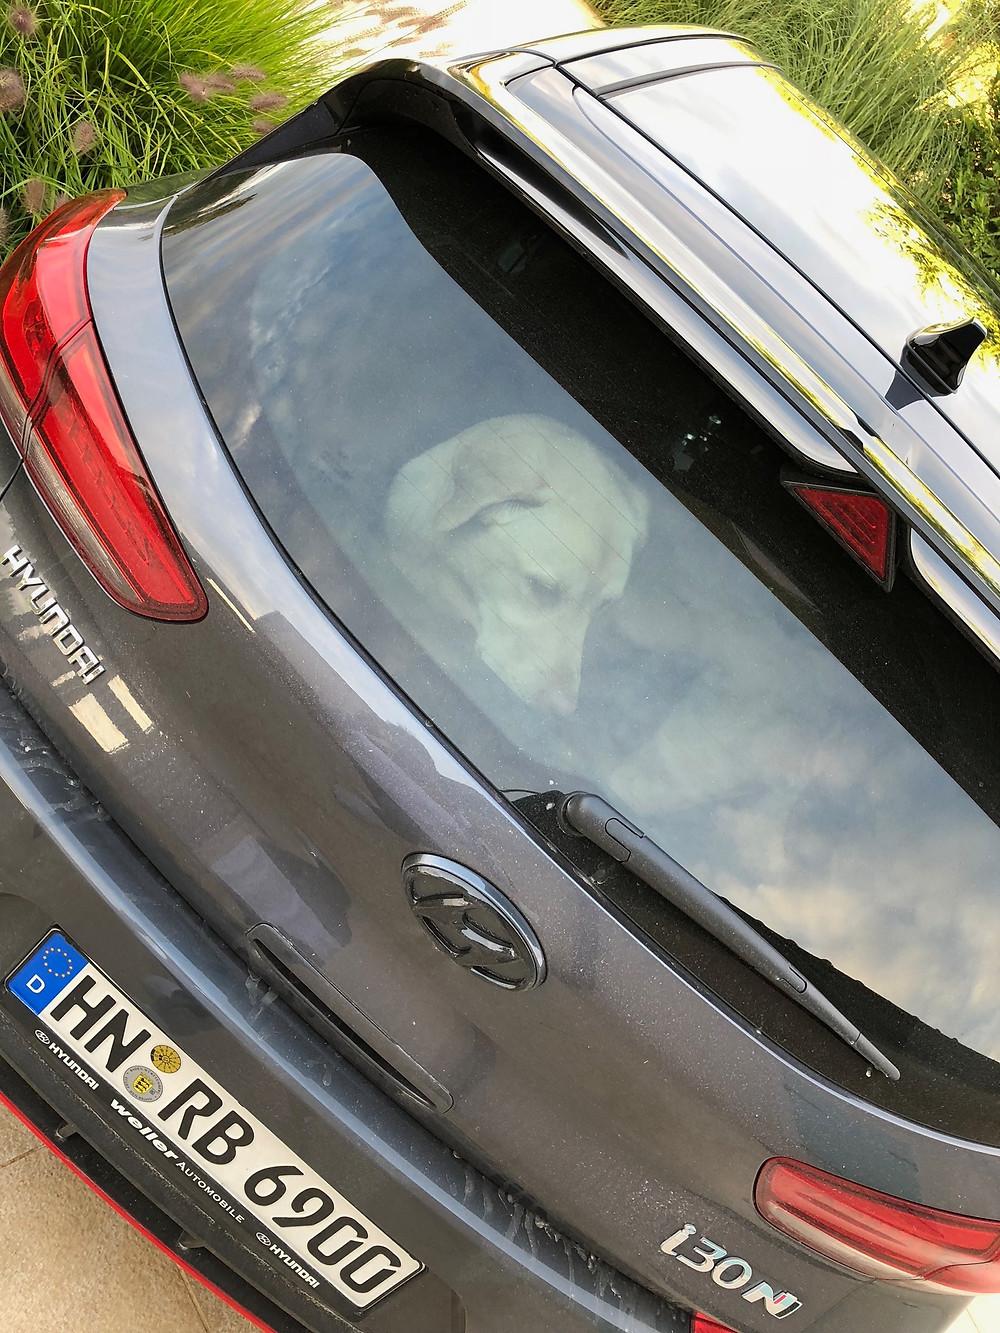 Hier seht ihr Casper (Labrador) im Kofferraum sitzen, passt perfekt!